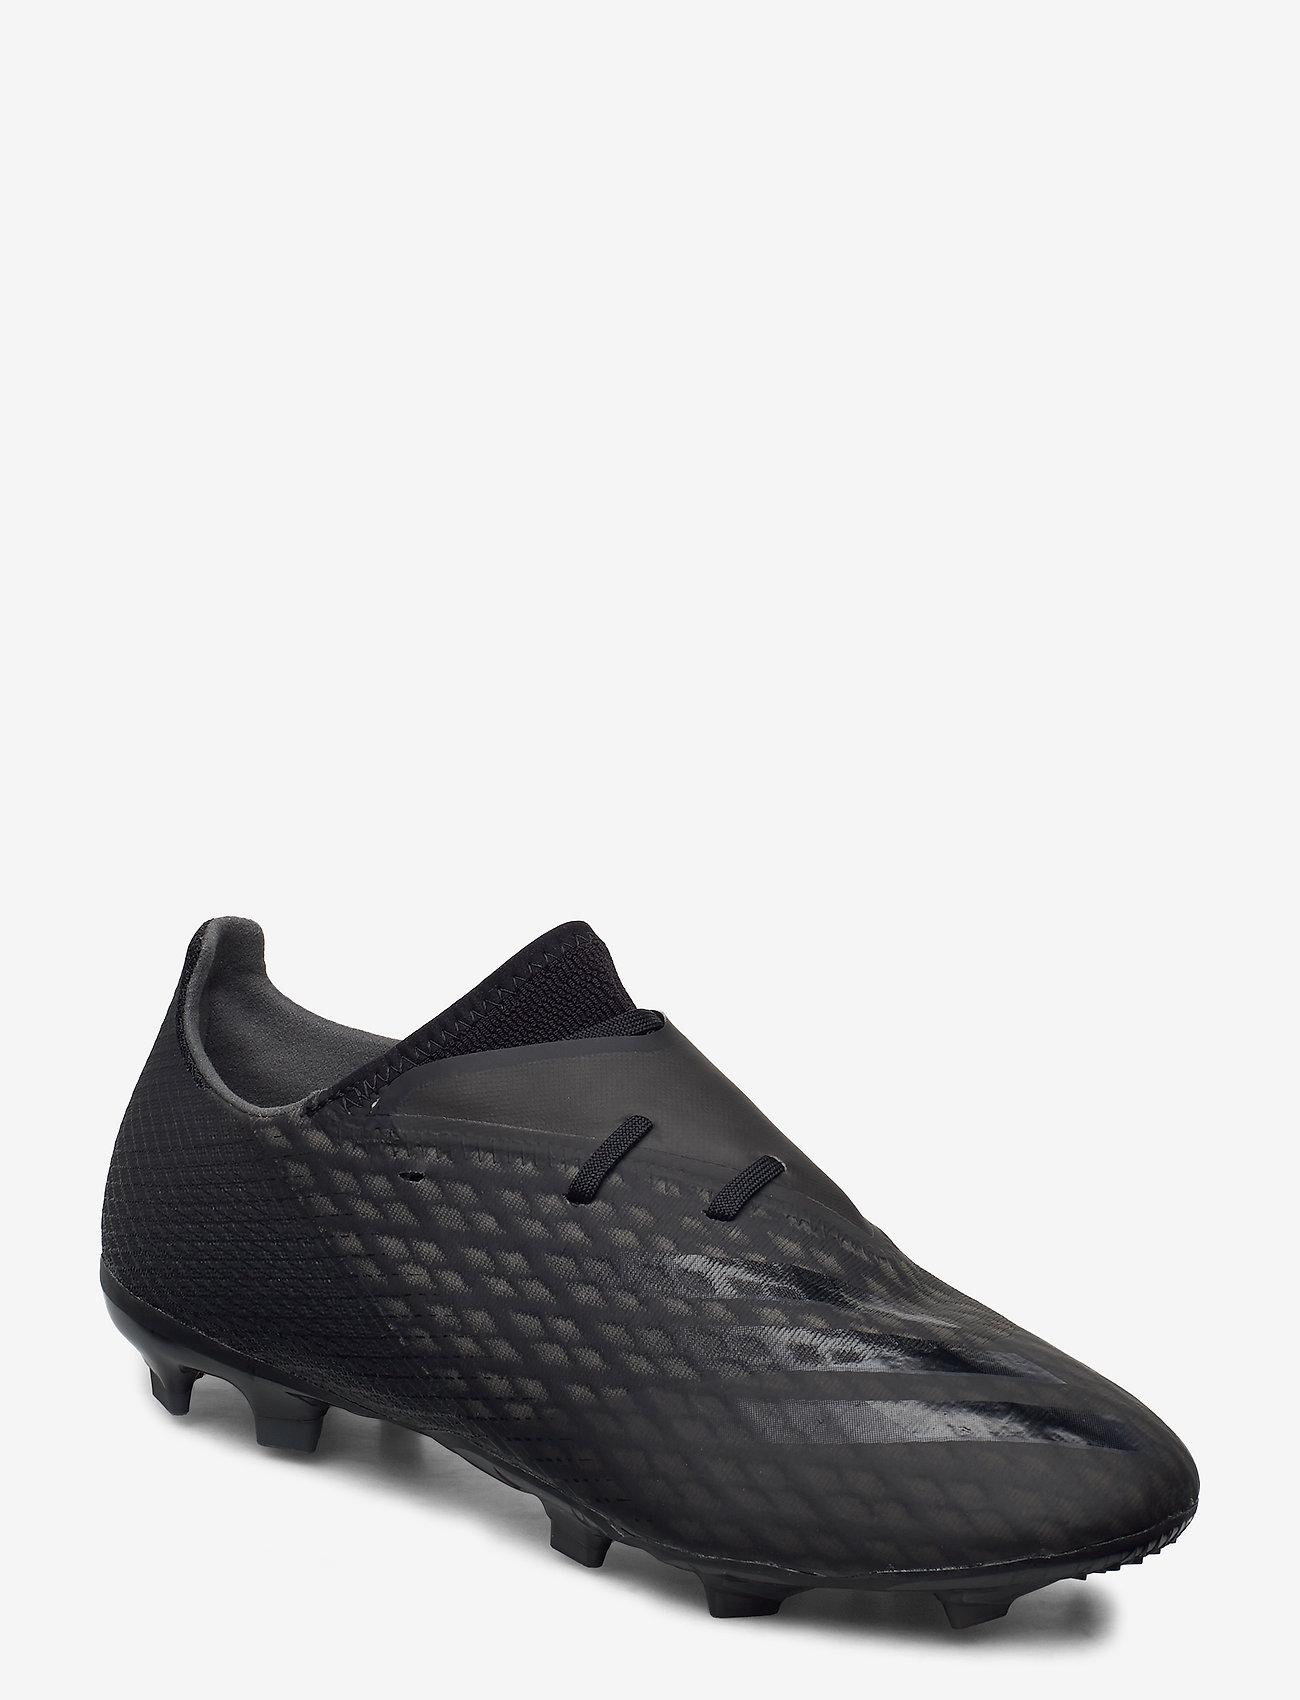 adidas Performance - X GHOSTED.2 FG - fotbollsskor - cblack/cblack/gresix - 0